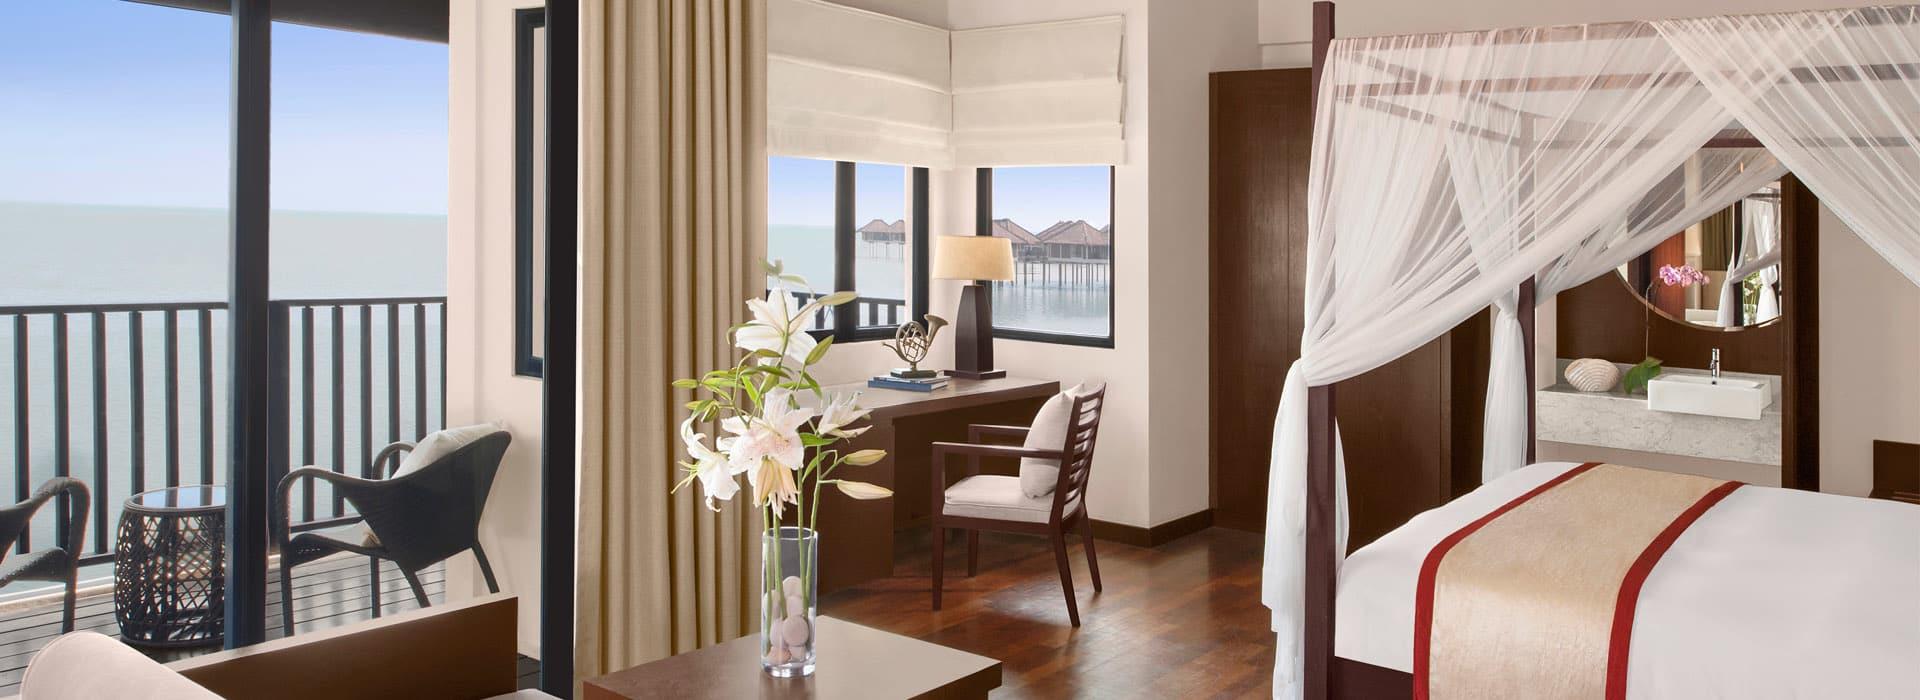 Sea view room at one of the Sepang Hotels Malaysia